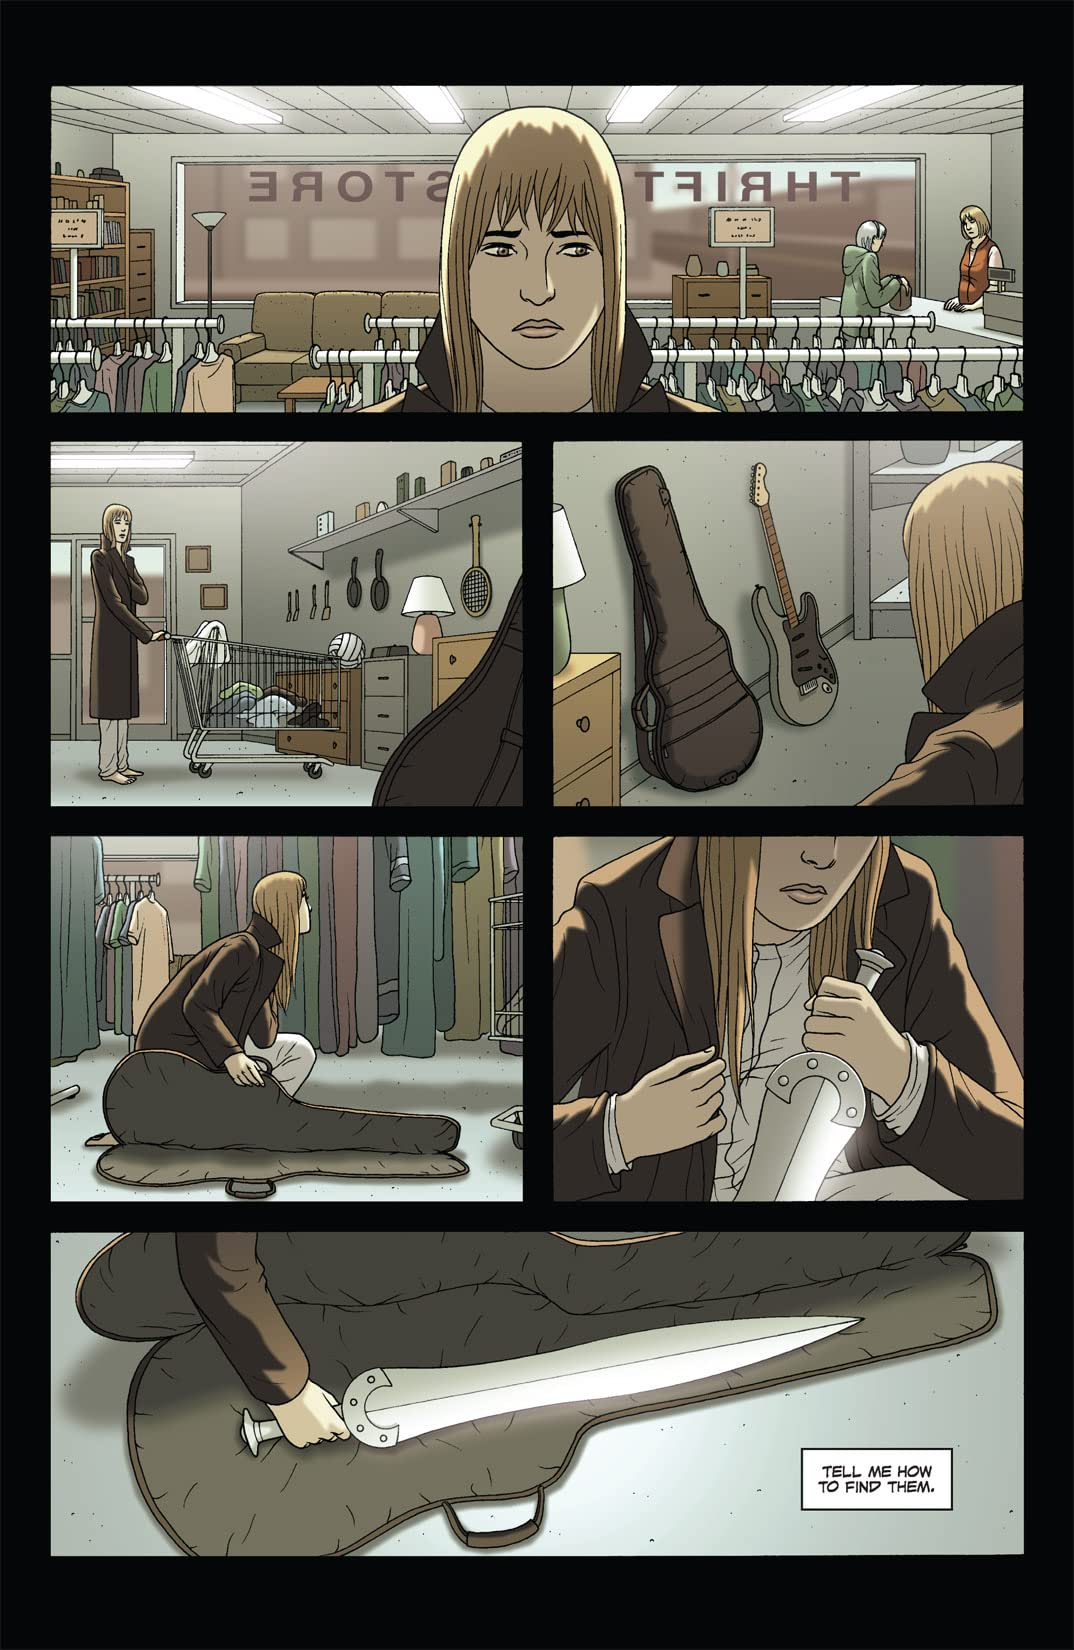 The Sword #7